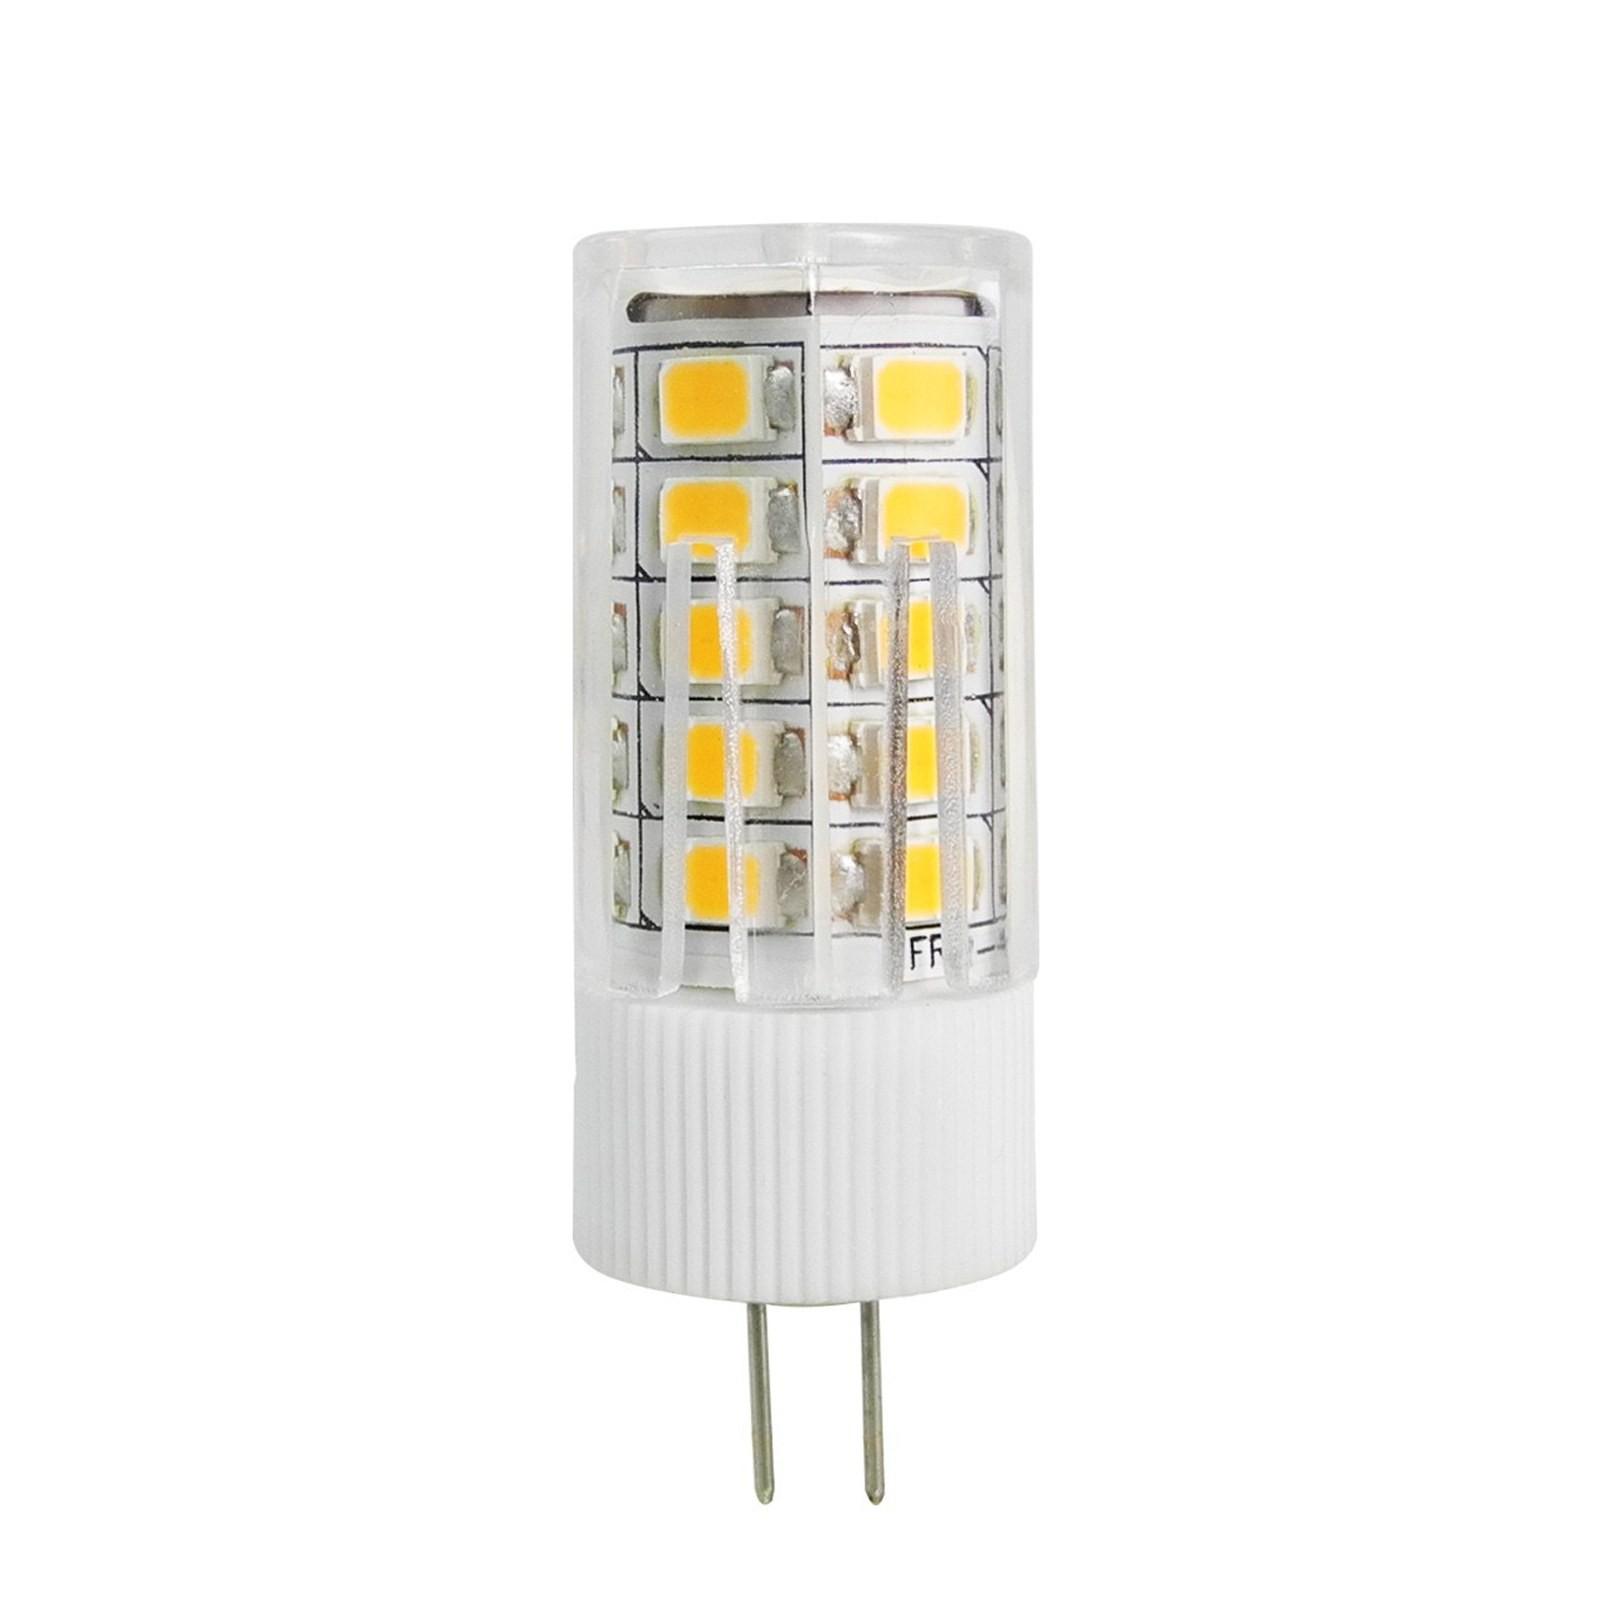 Lampada lampadina g4 3 w led smd luce bianco freddo per for Lampadina led 3w